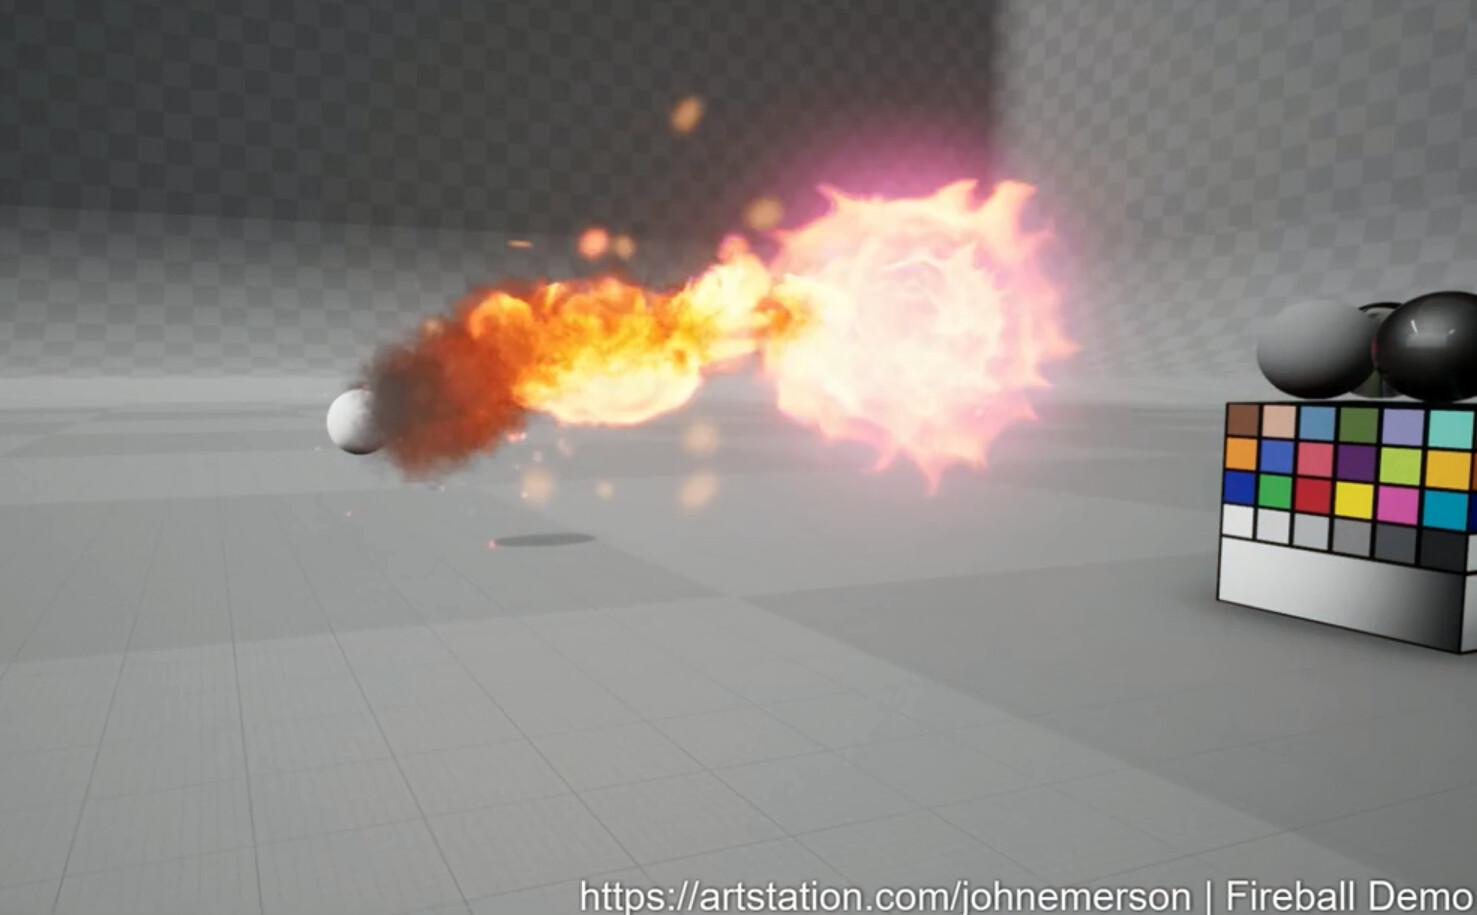 John emerson john emerson fireball closeup